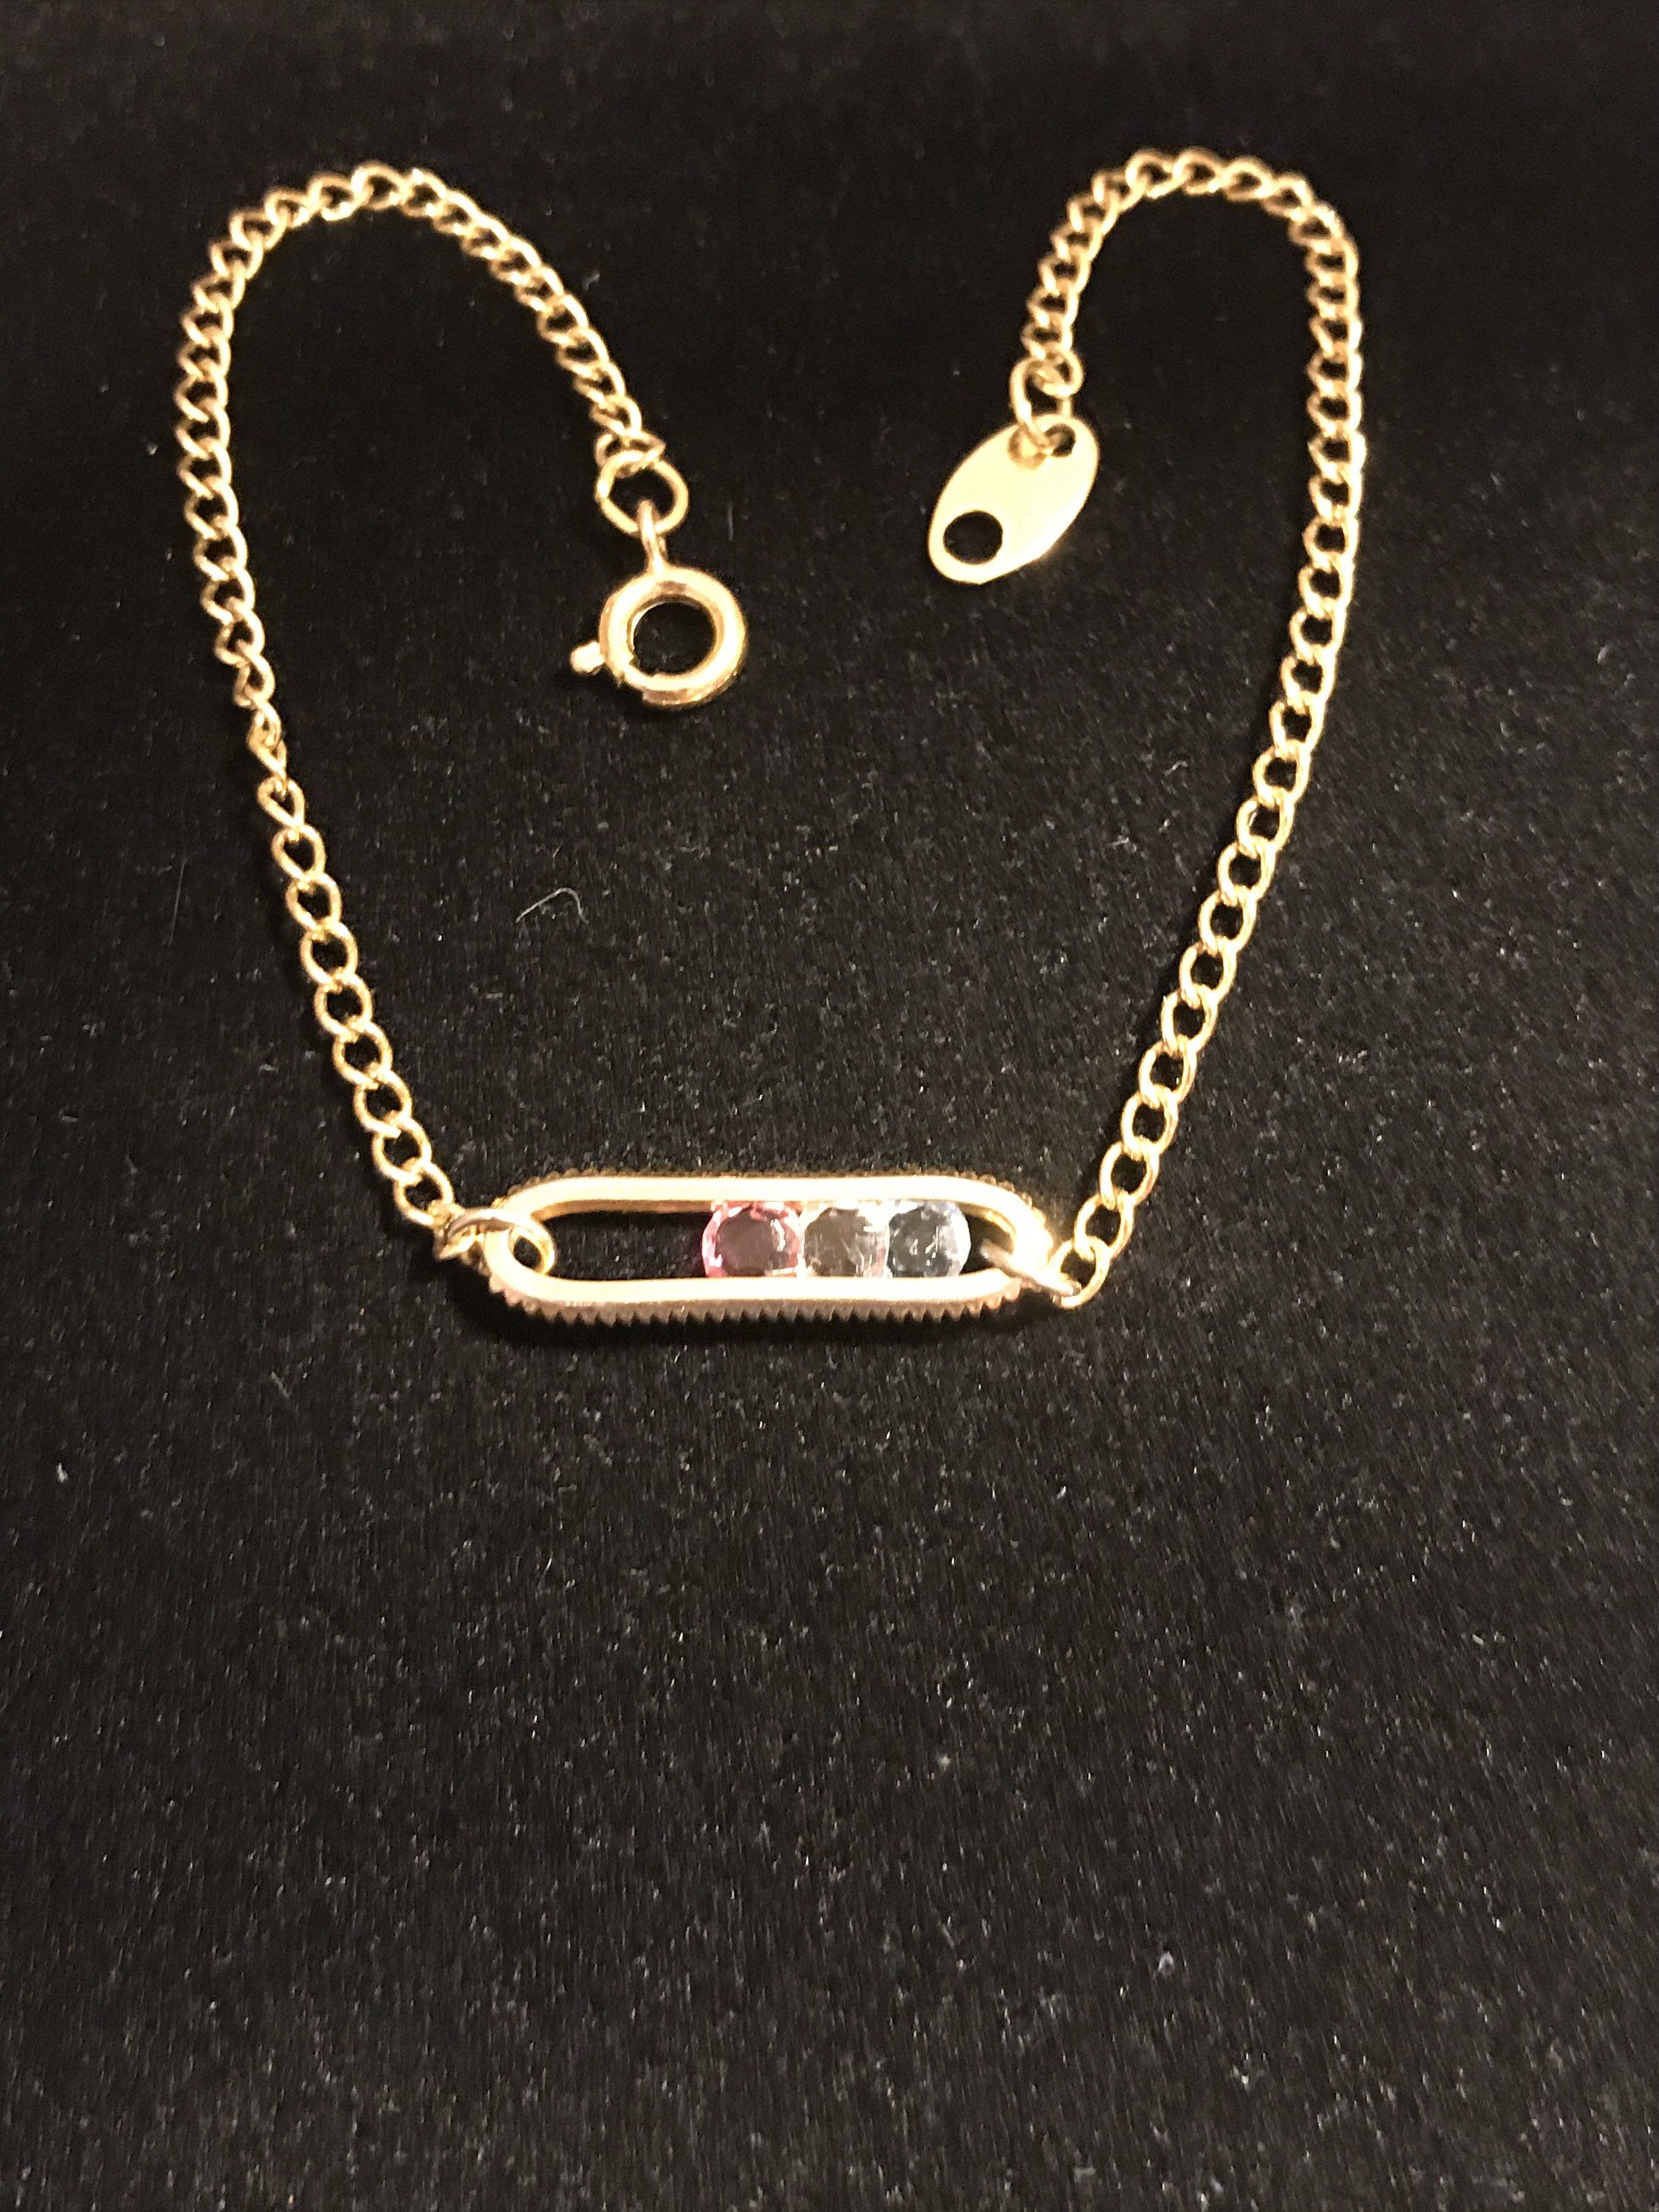 Avon Vintage Goldtone Chain And Sliding Crystal Bracelet In 2020 Crystal Bracelets Avon Jewelry Gold Tones